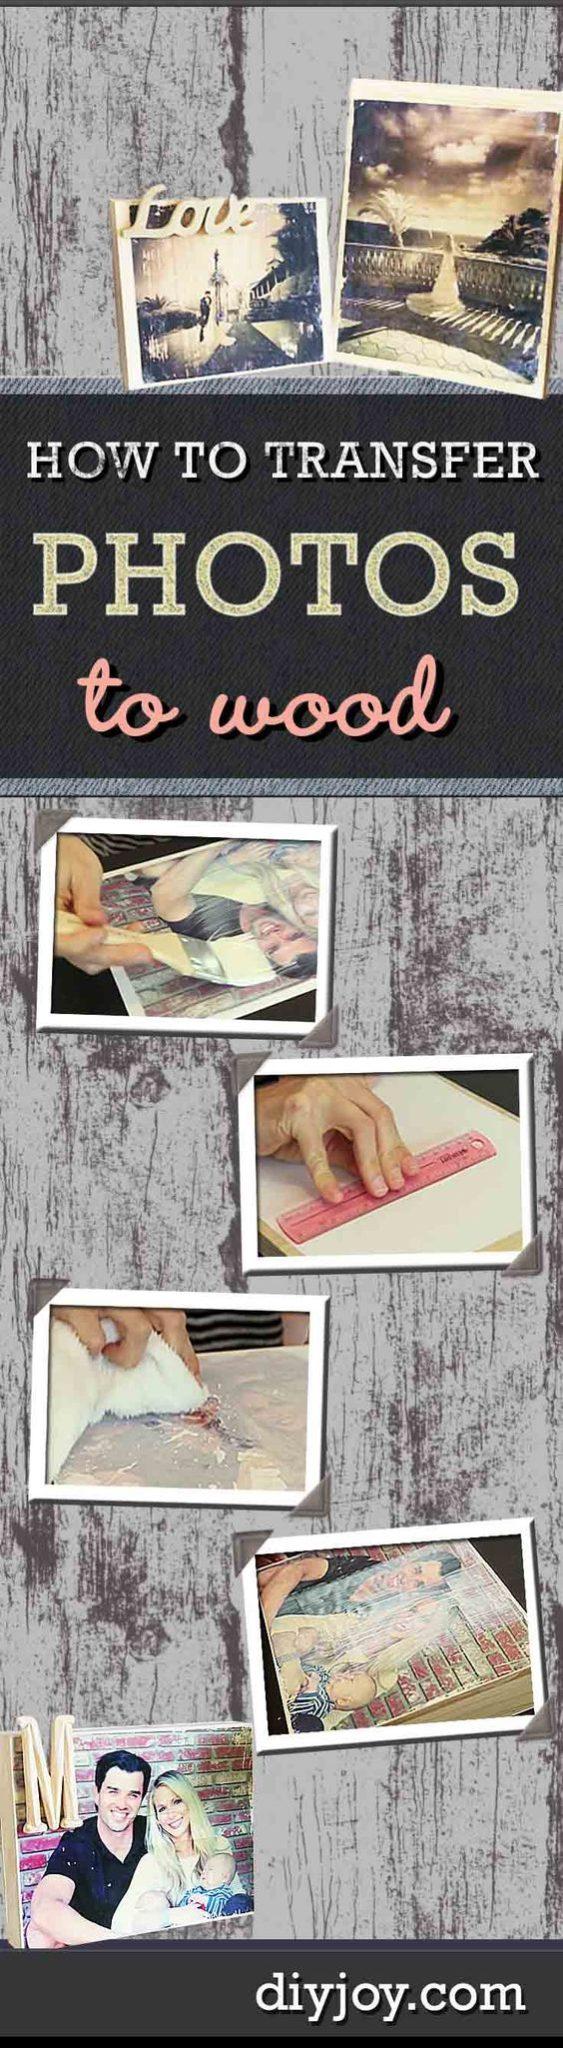 DIY ιδέες για να μεταφέρετε φωτογραφίες σε ξύλο1